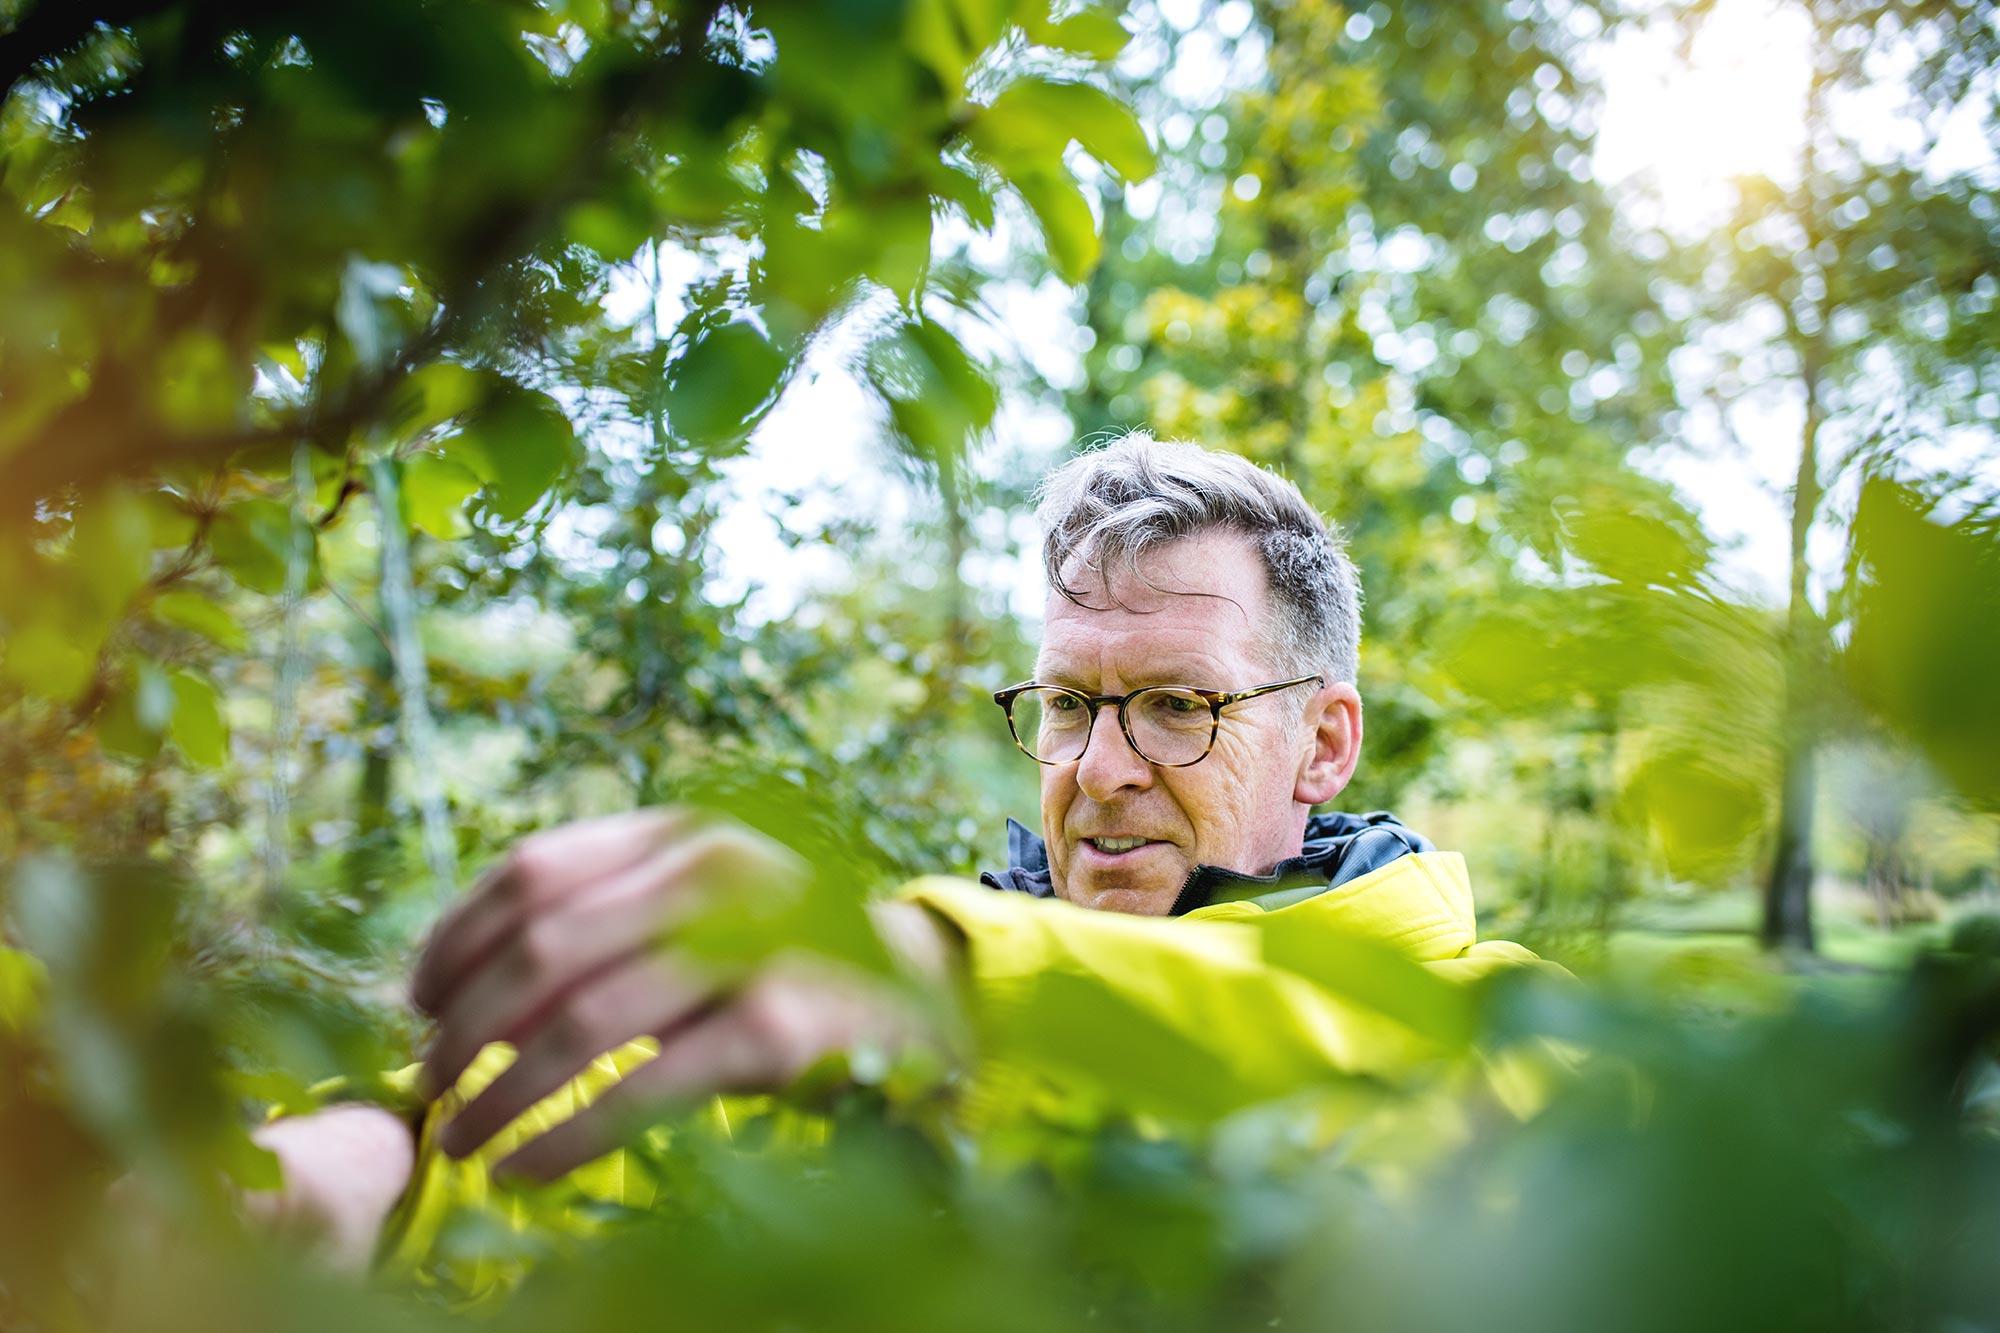 Santiago Advisors Beratungsagentur Imagemotive Baumpflanzen im Wald Project Zero Natur Mann konzentriert